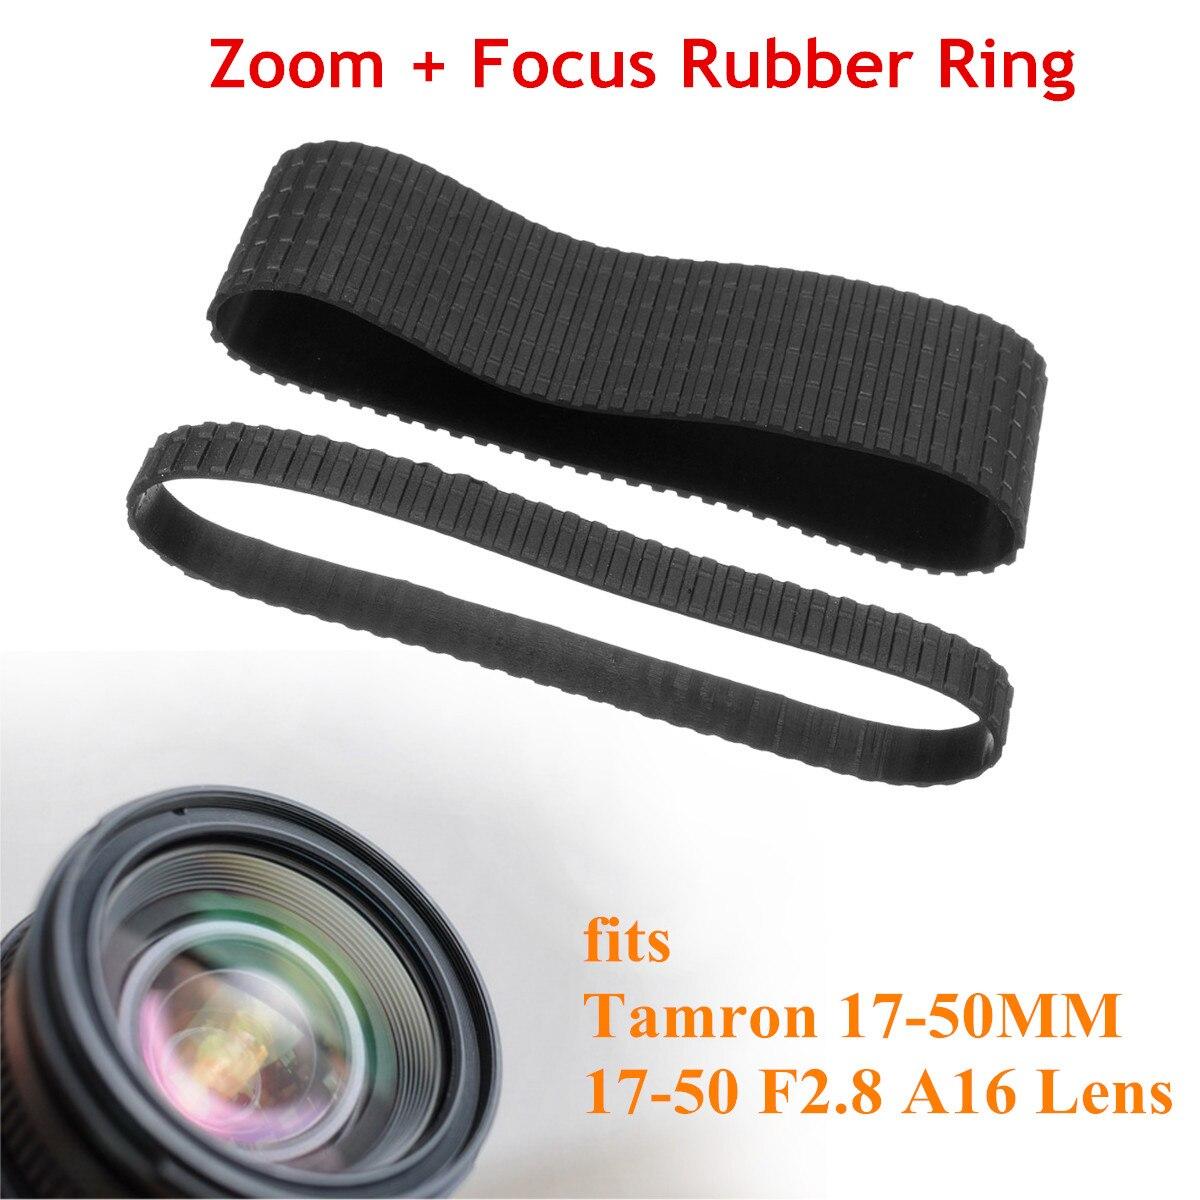 Para enfoque Zoom goma antideslizante Sustitución de anillo Set para Tamron 17-50MM 17-50 F2.8 lente A16